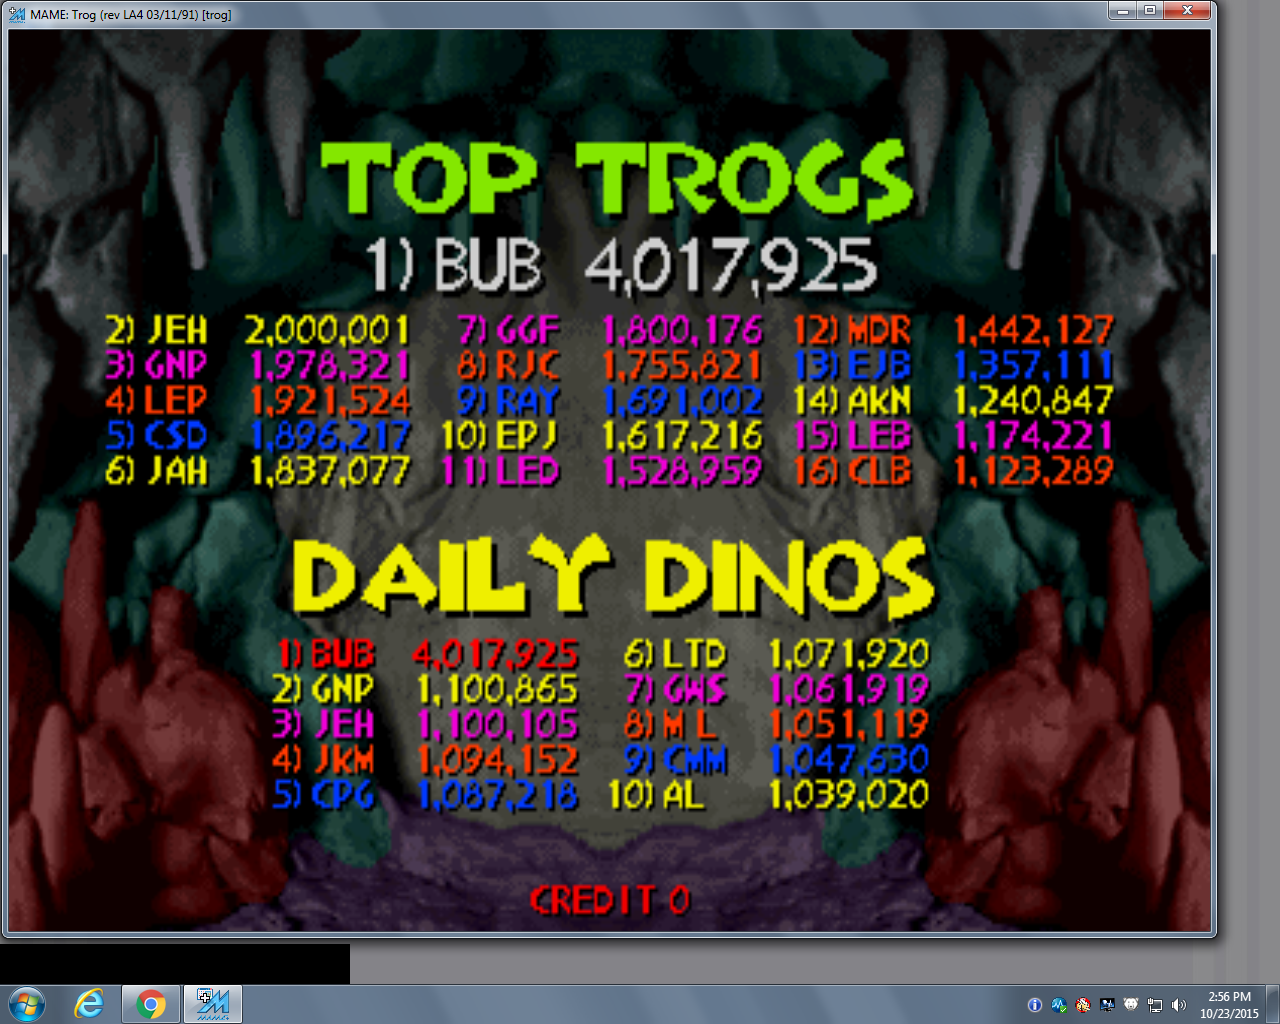 bubufubu: Trog (Arcade Emulated / M.A.M.E.) 4,017,925 points on 2015-10-23 17:27:17